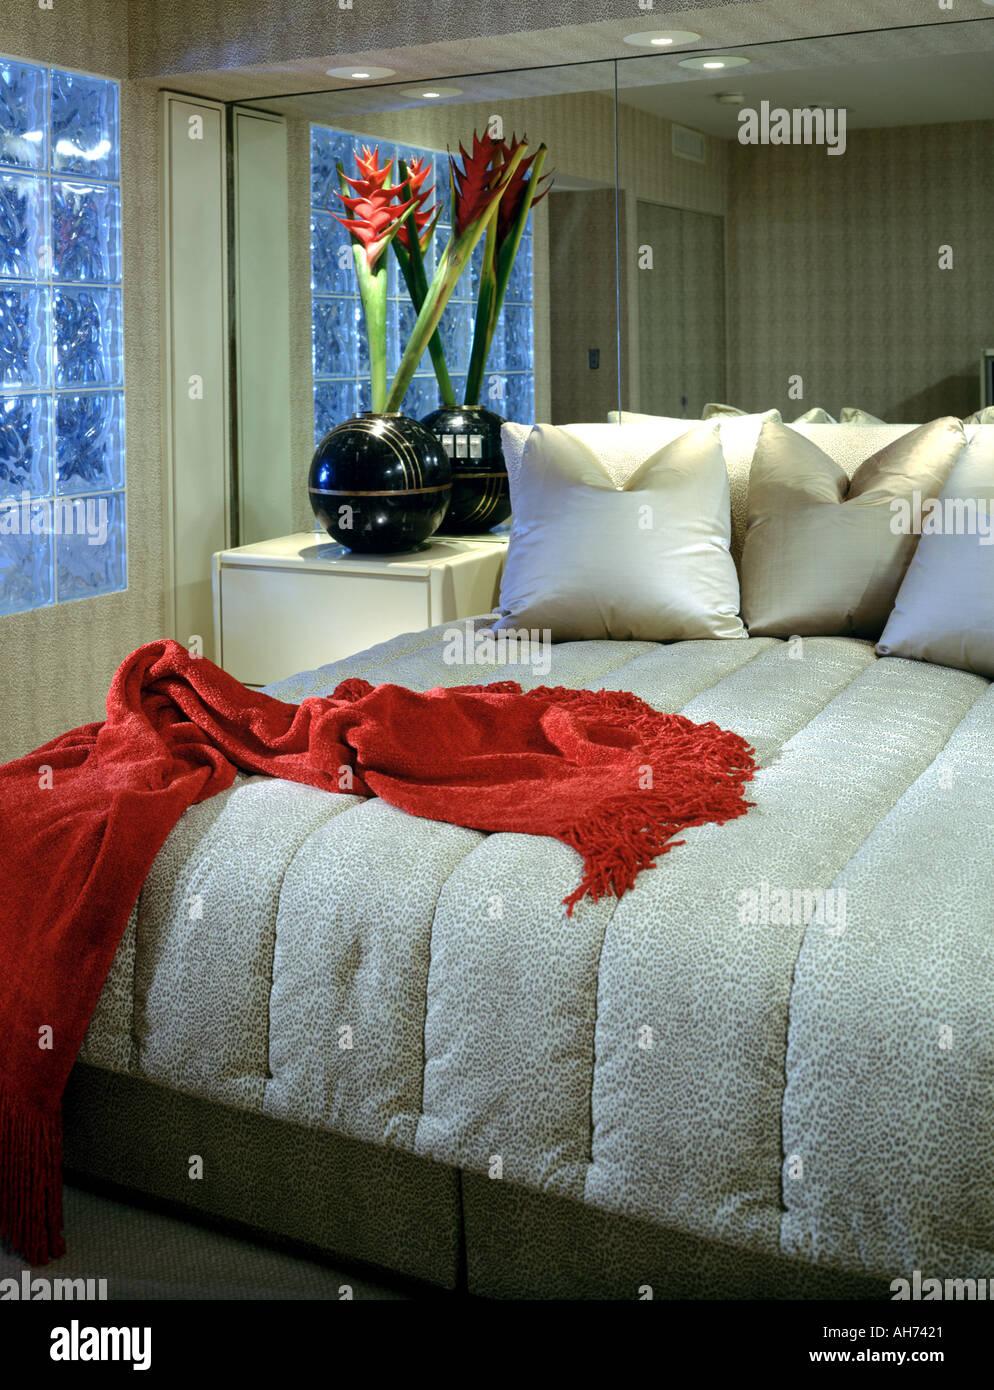 bedroom residential interior carpet bed headboard comforter ...